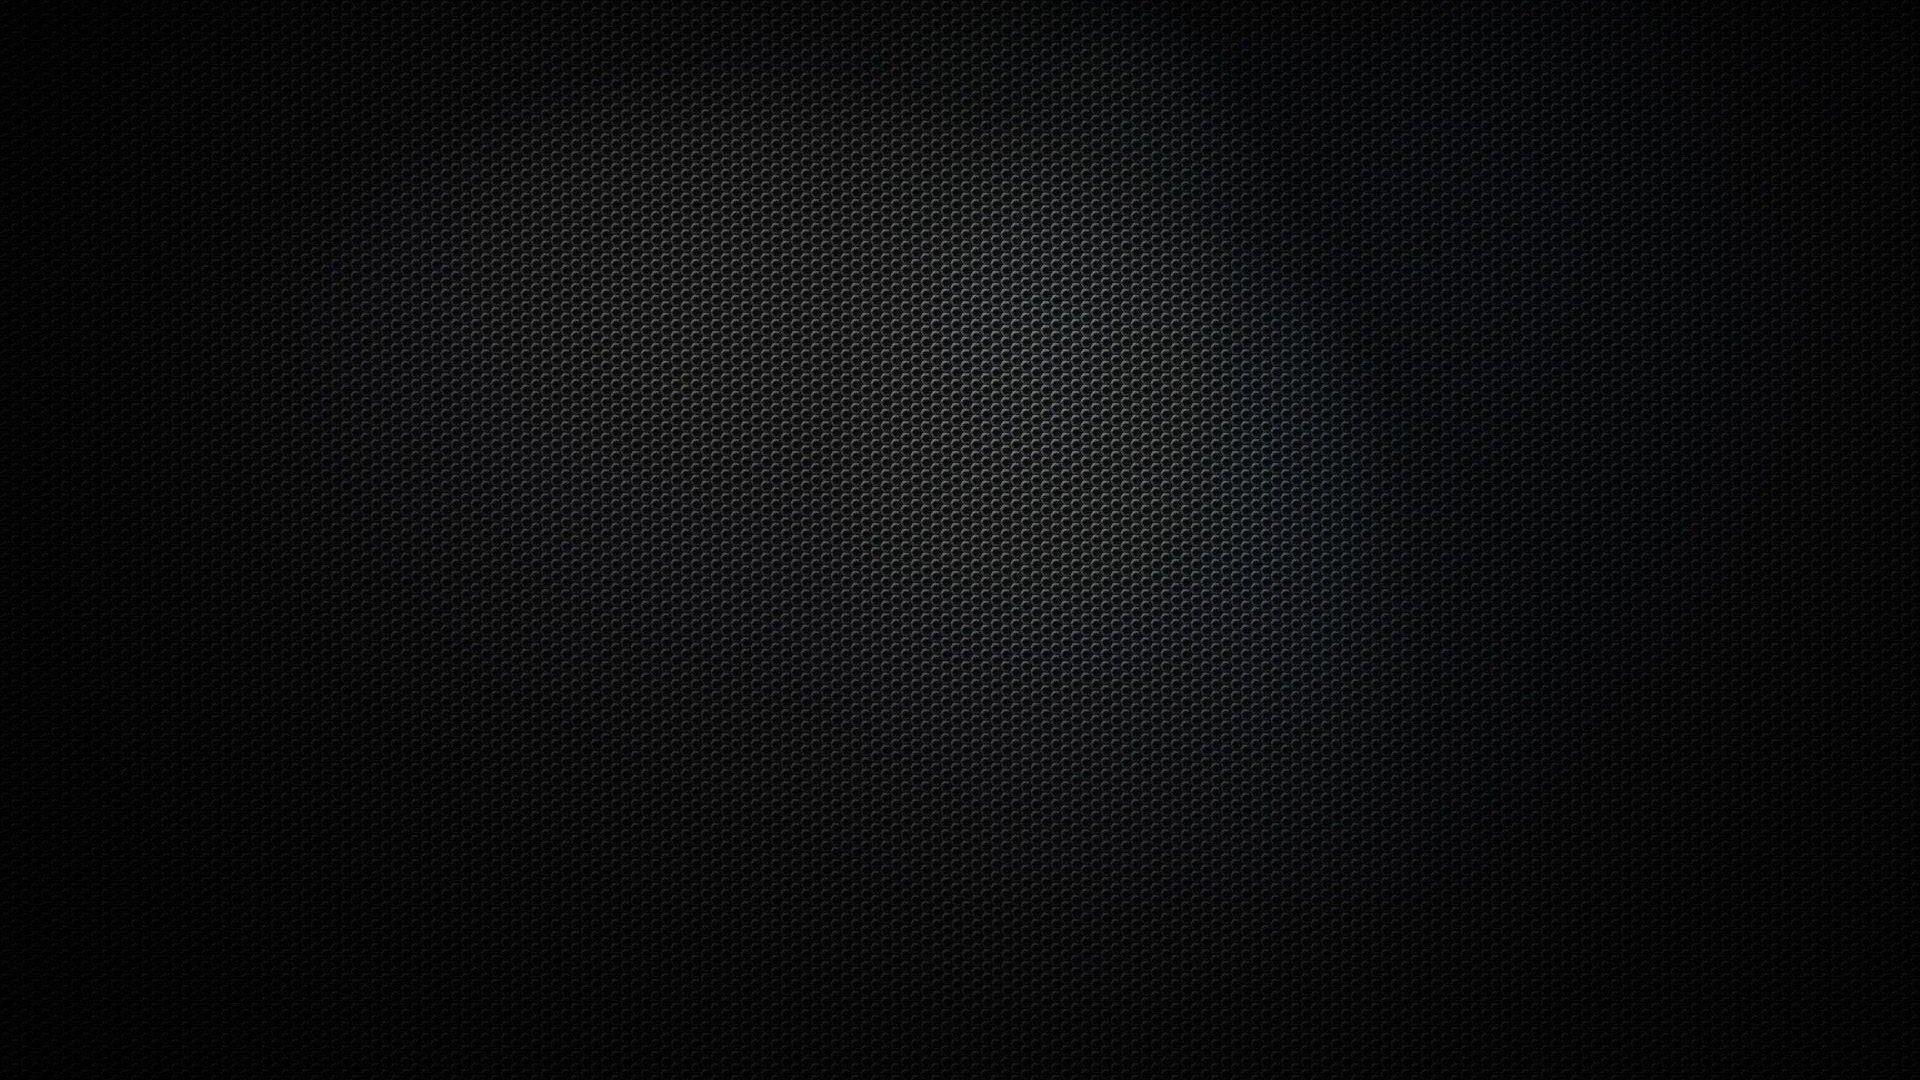 Desktop Backgrounds Black - Wallpaper Cave